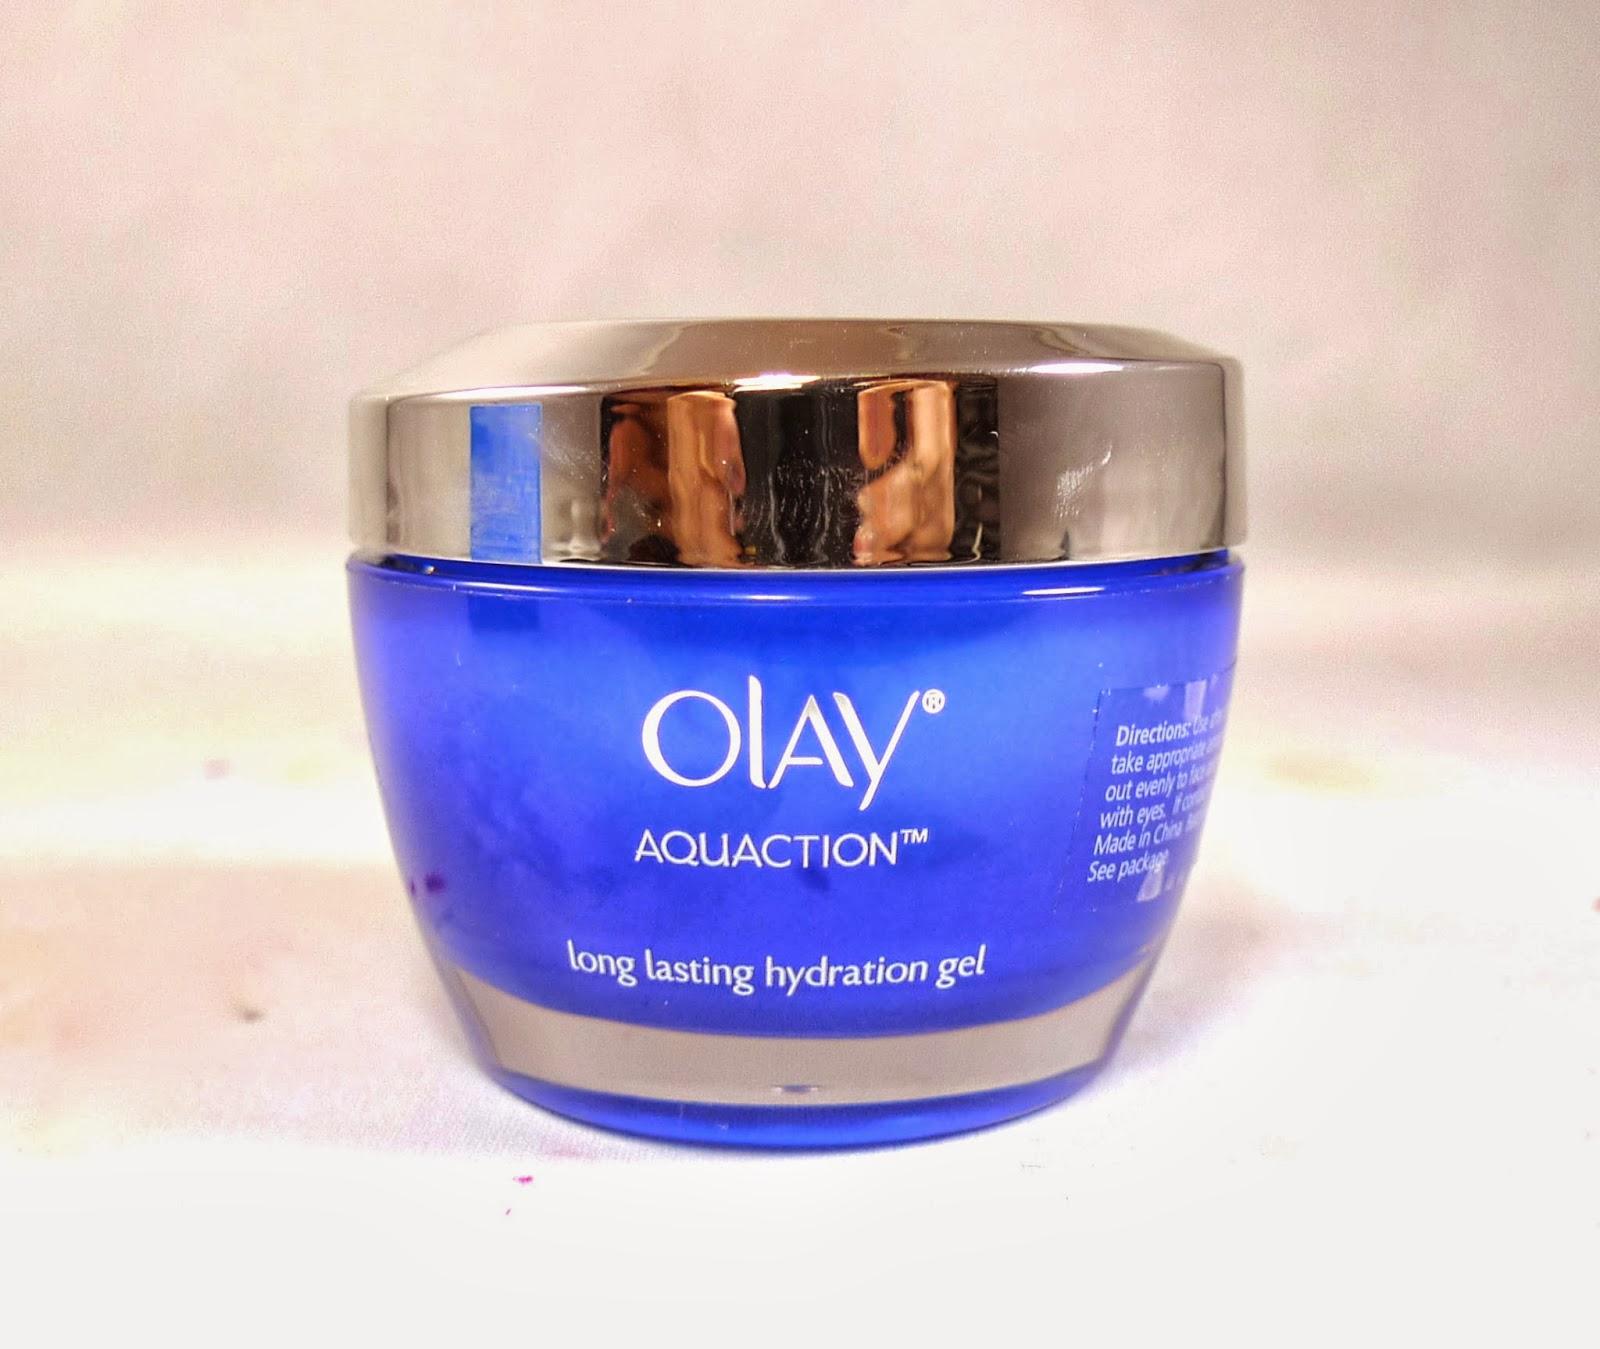 Olay Aquaction Moisturizer Long Lasting Hydration Gel